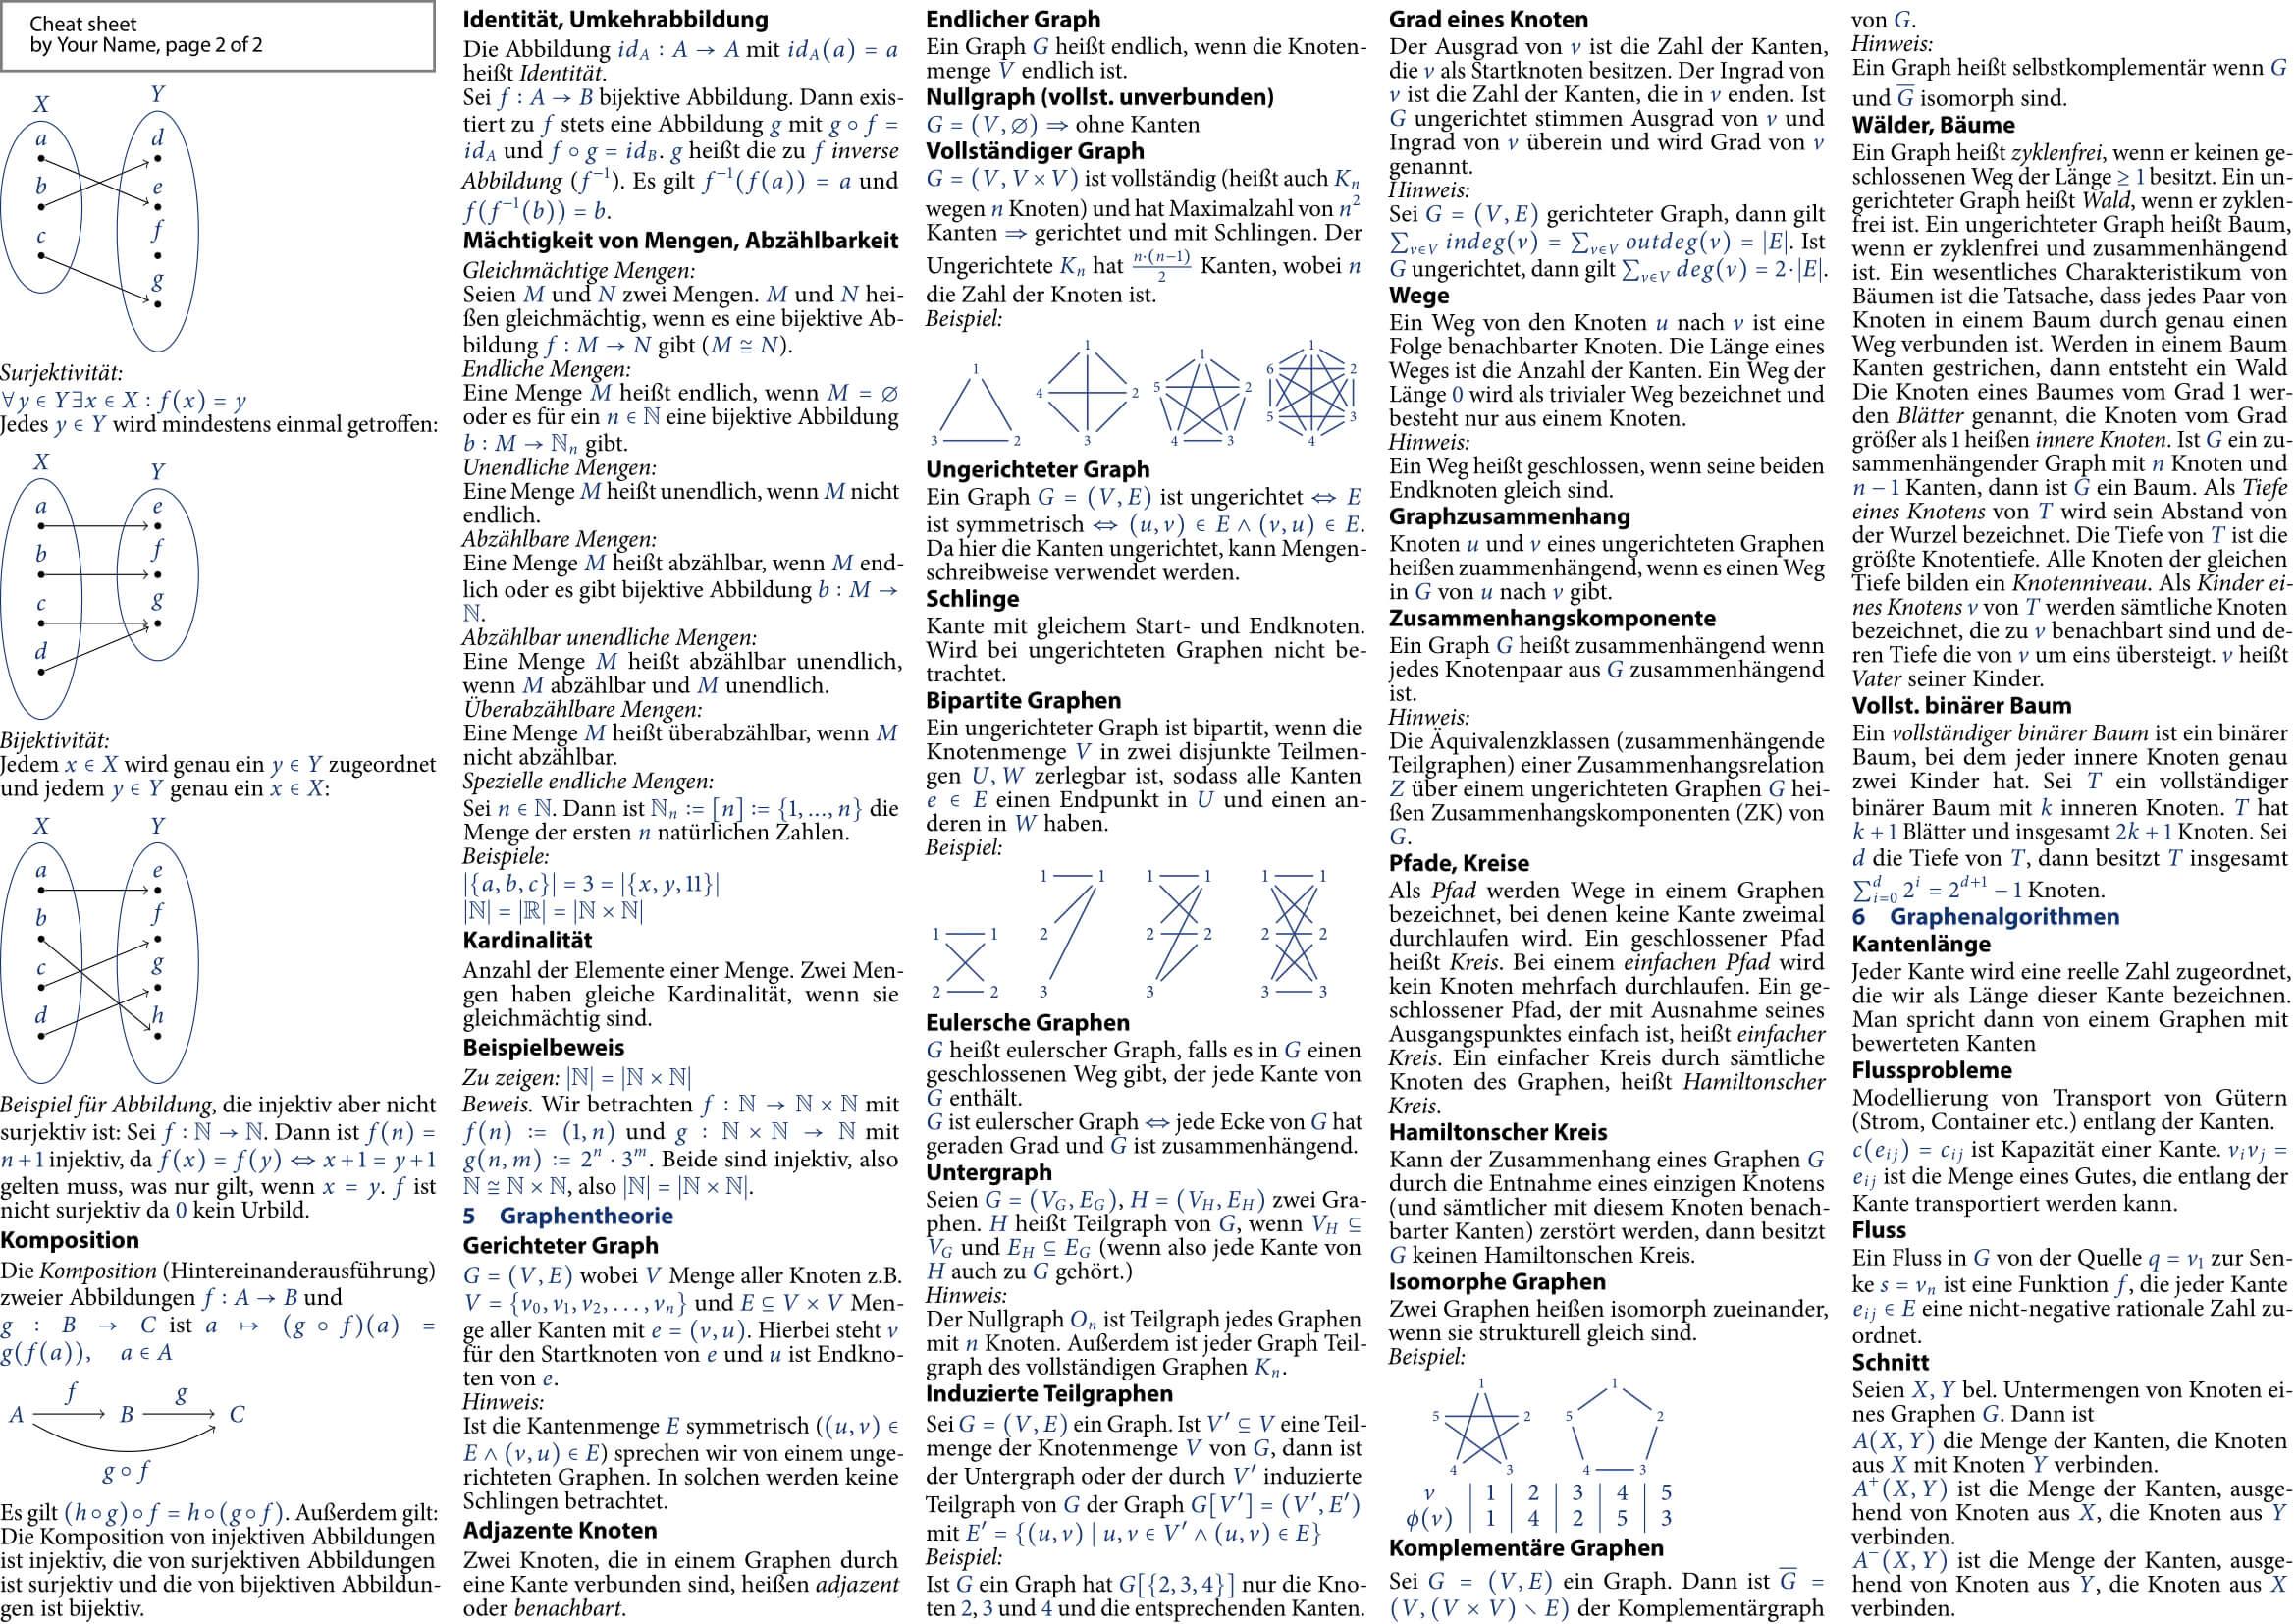 Contribute A Cheatsheet Cheat Sheet Template Blank Word Docx Pertaining To Cheat Sheet Template Word